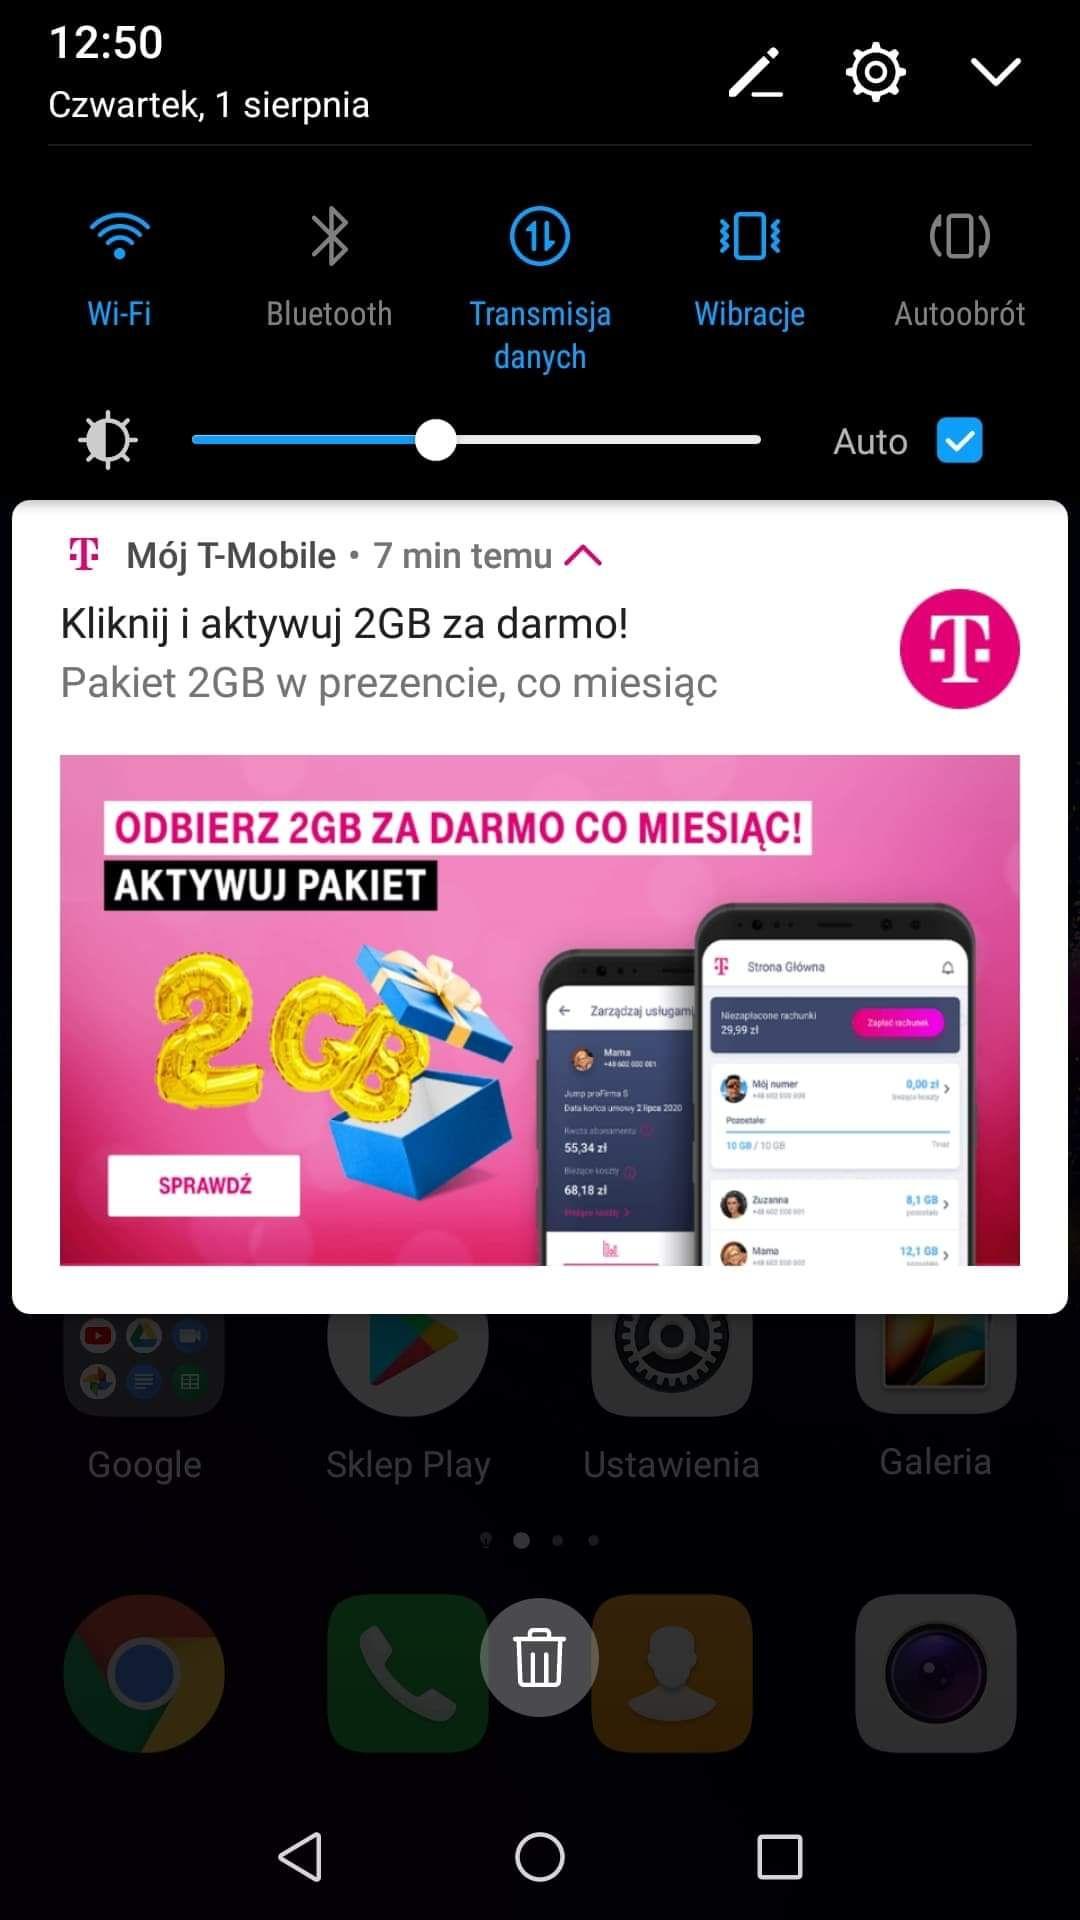 T- mobile za darmo 2gb co miesiąc